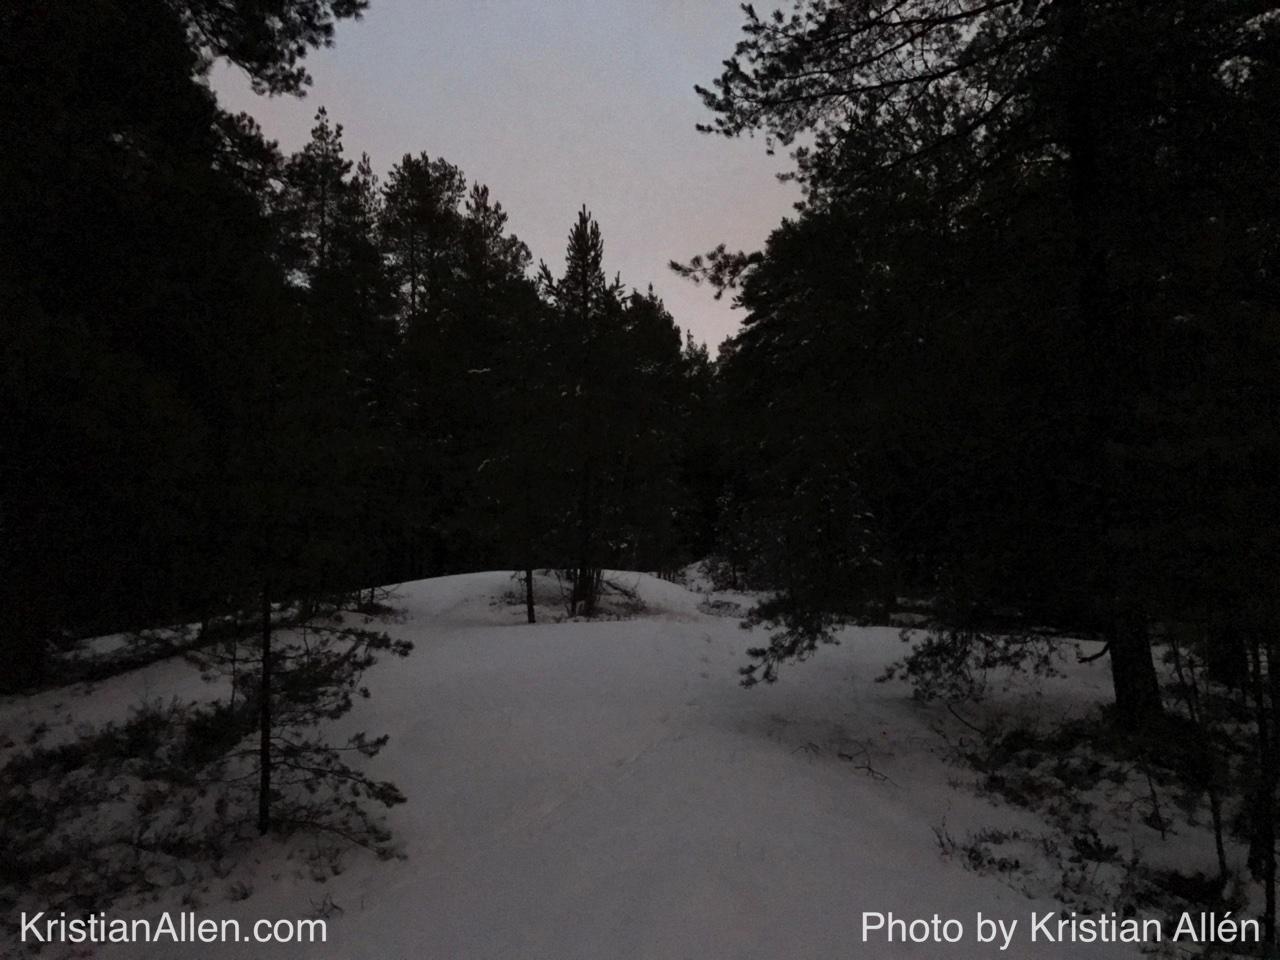 13.1.2017 21.11 km Run